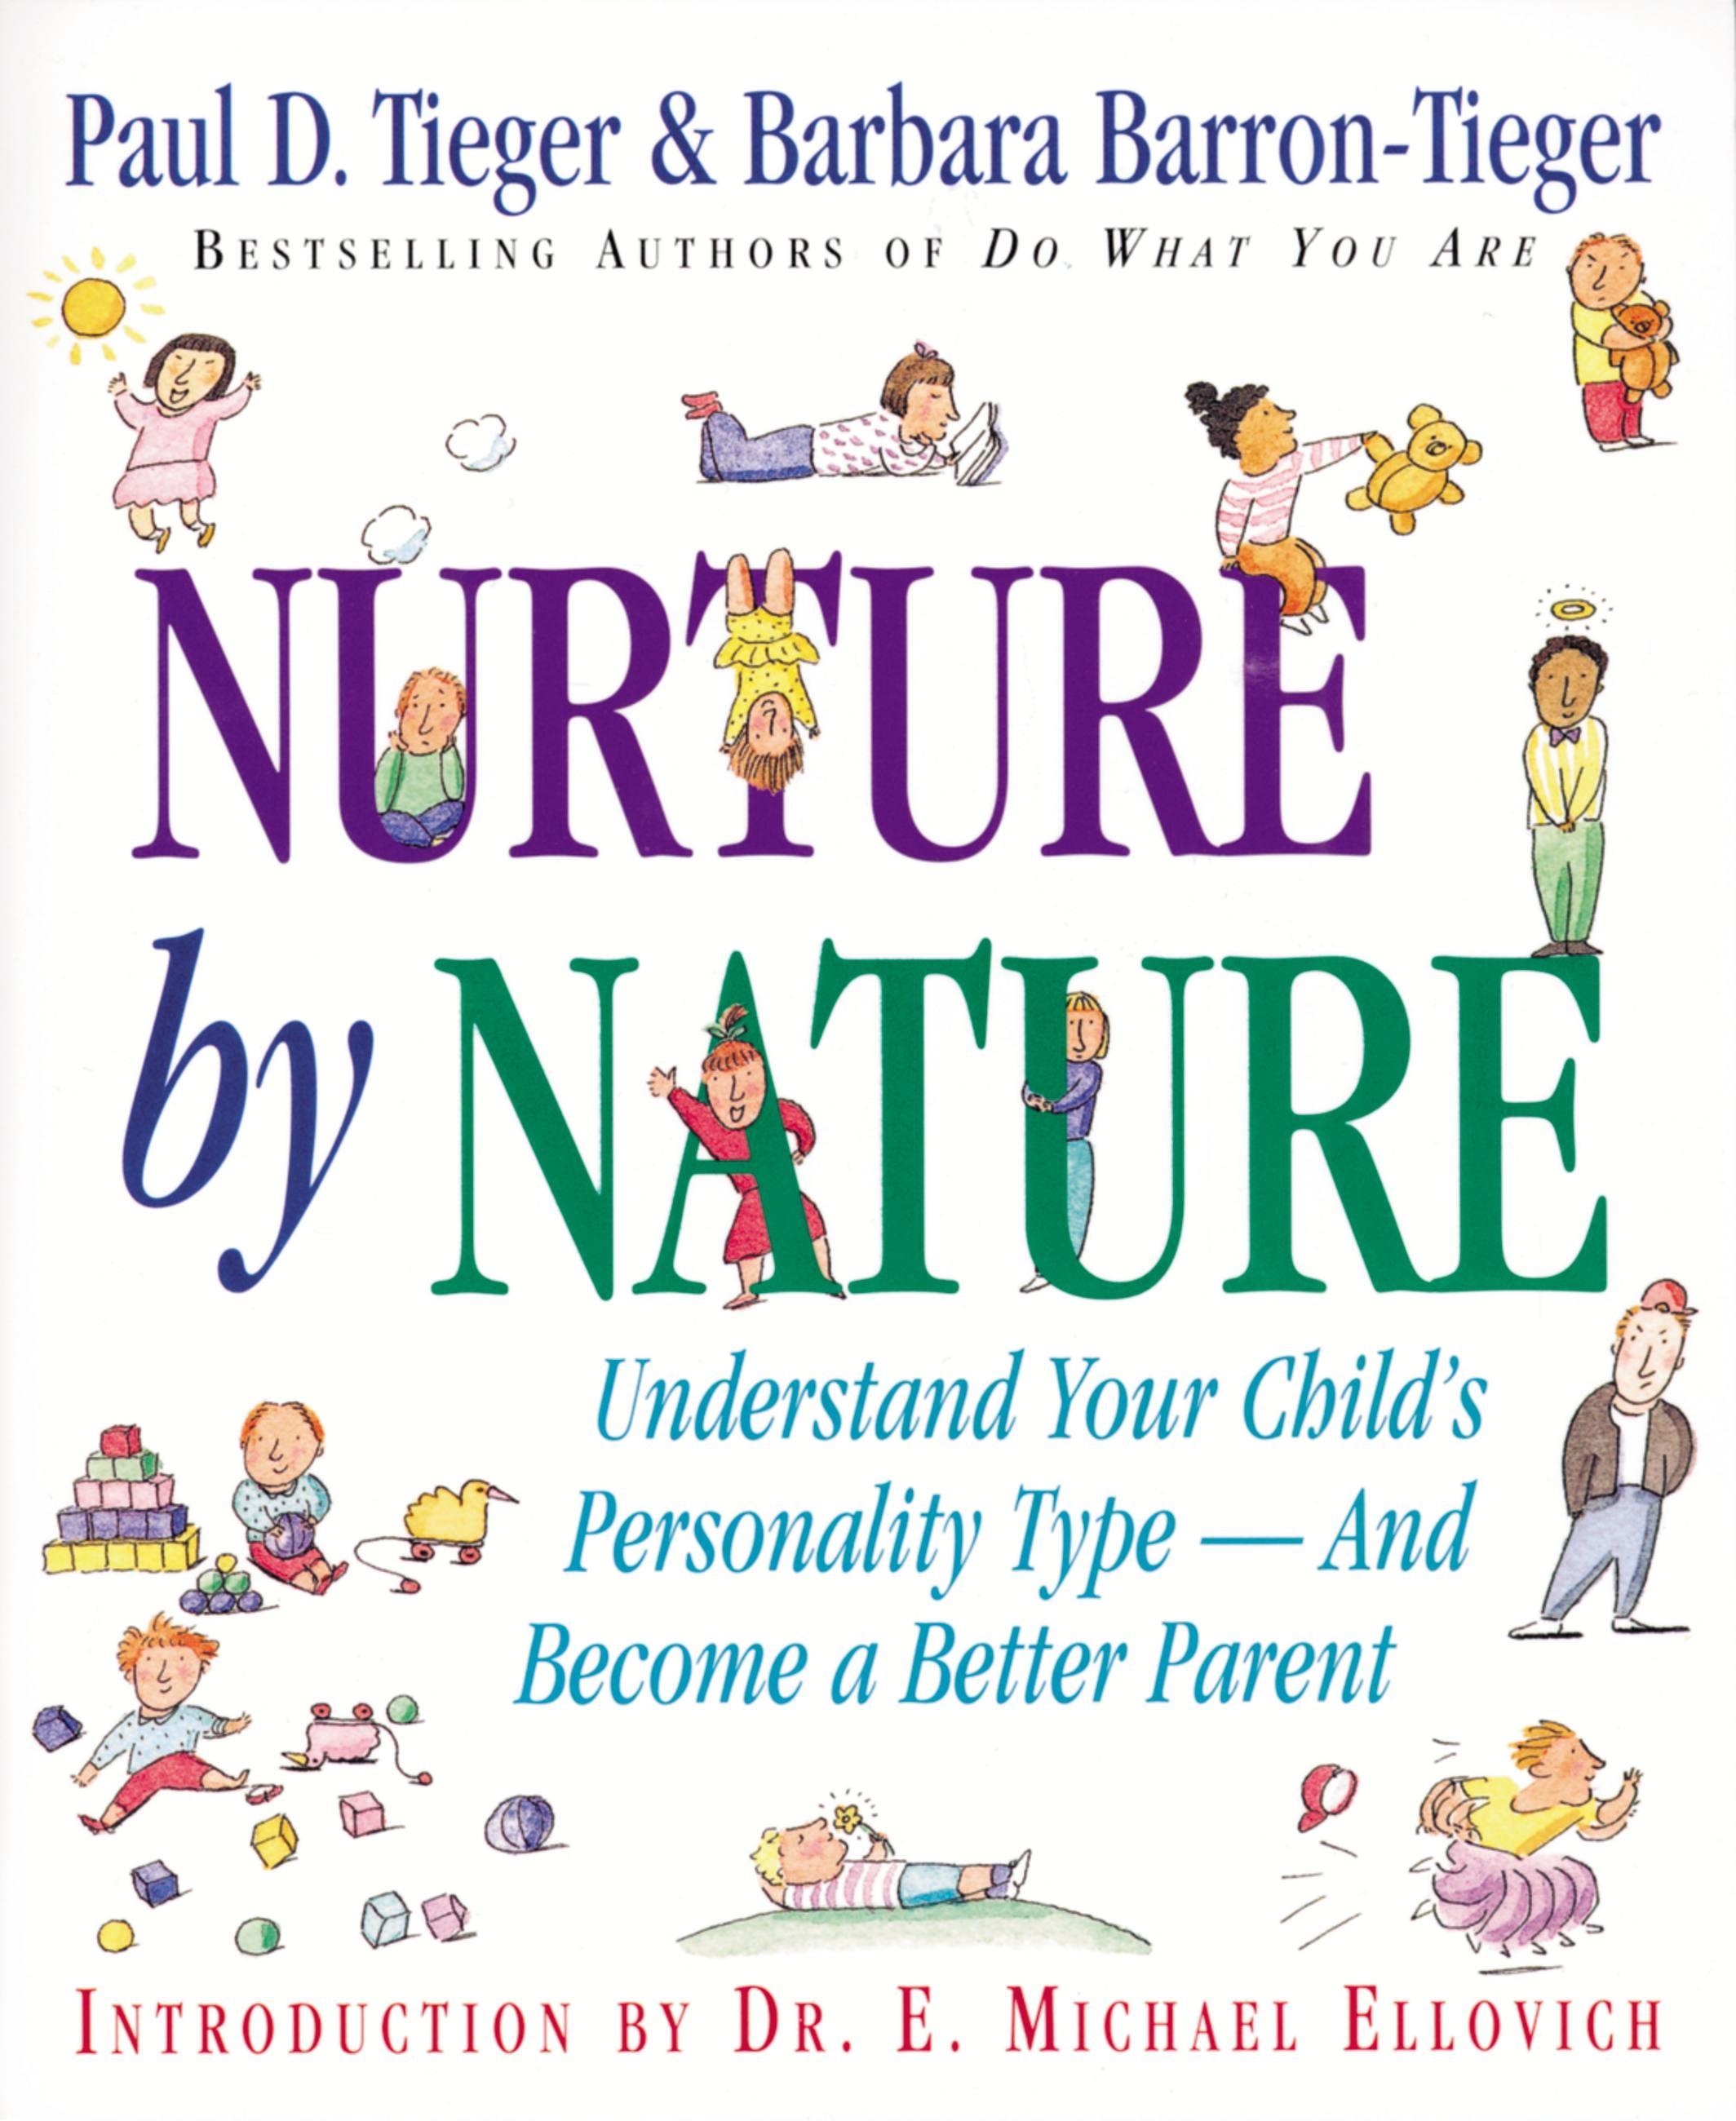 Nurture by Nature by Paul D. Tieger | Hachette Book Group